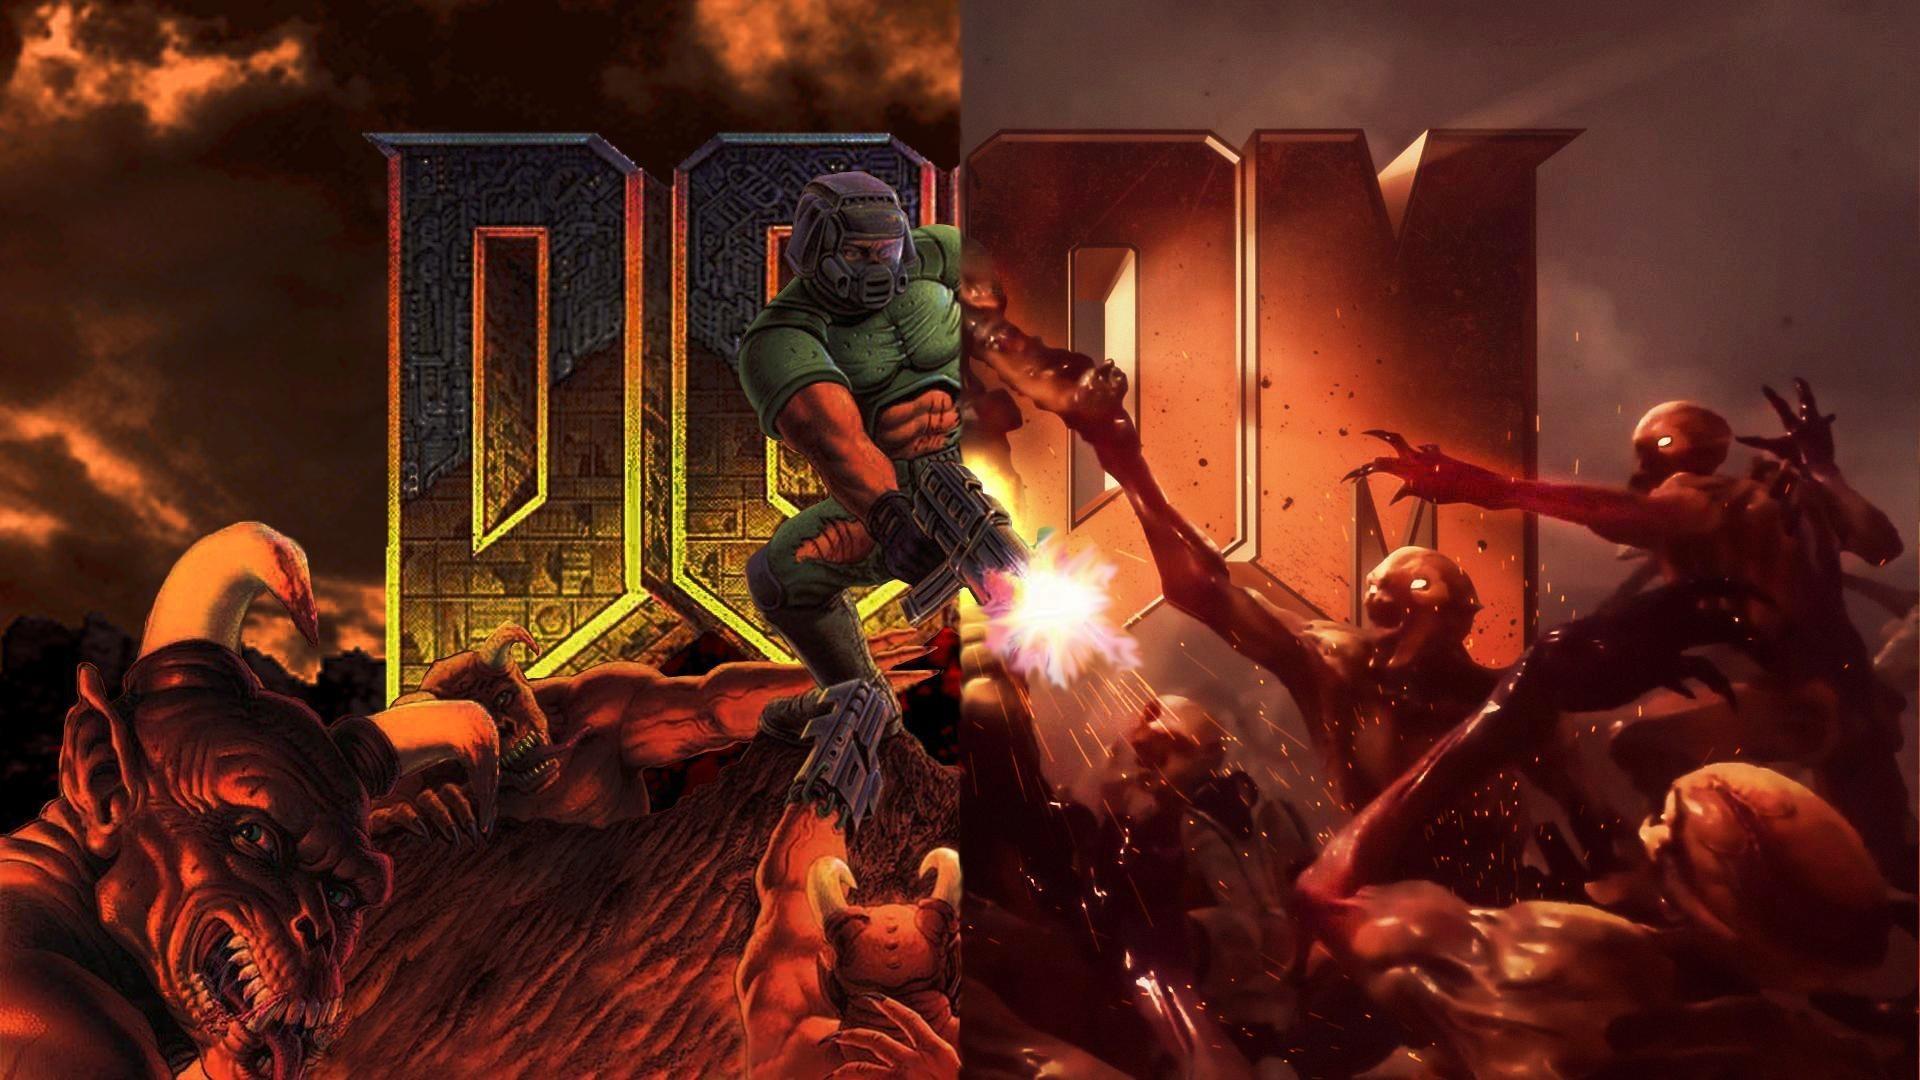 Res: 1920x1080,  Doom wallpaper images Dota Wallpapers Dota private | HD Wallpapers  | Pinterest | Hd wallpaper